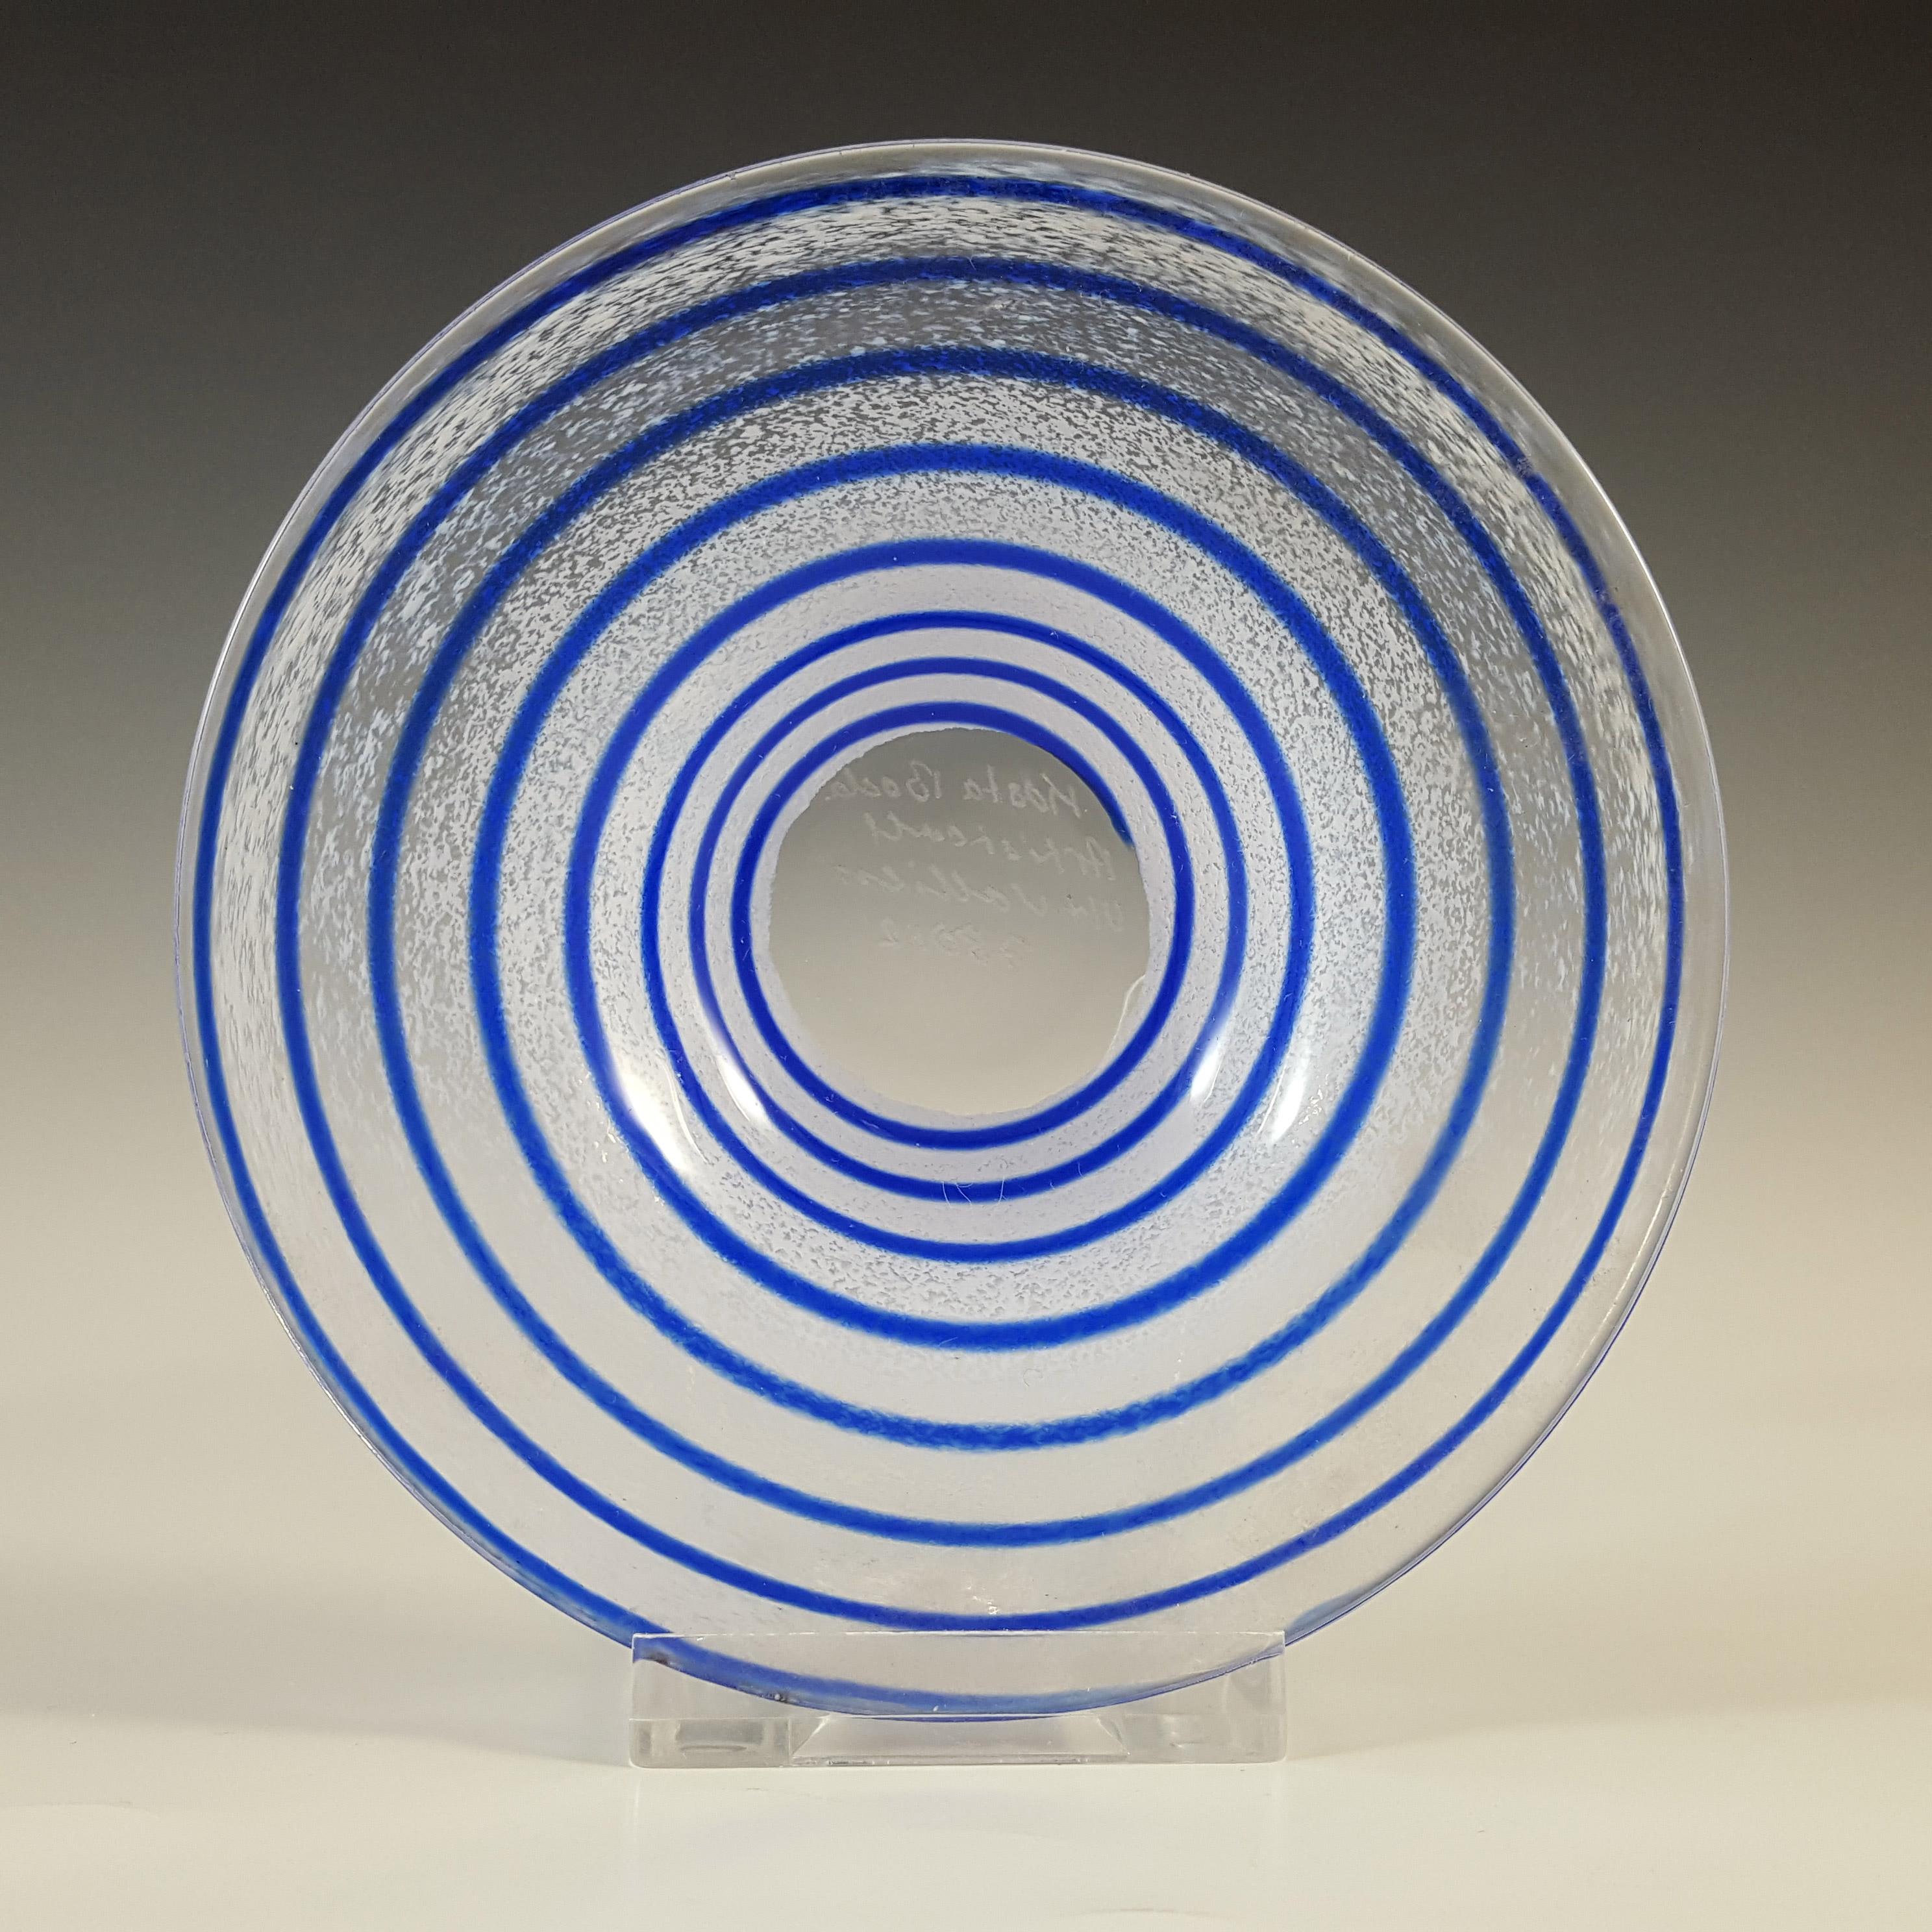 SIGNED Kosta Boda Glass Plate by Ulrica Vallien #78012